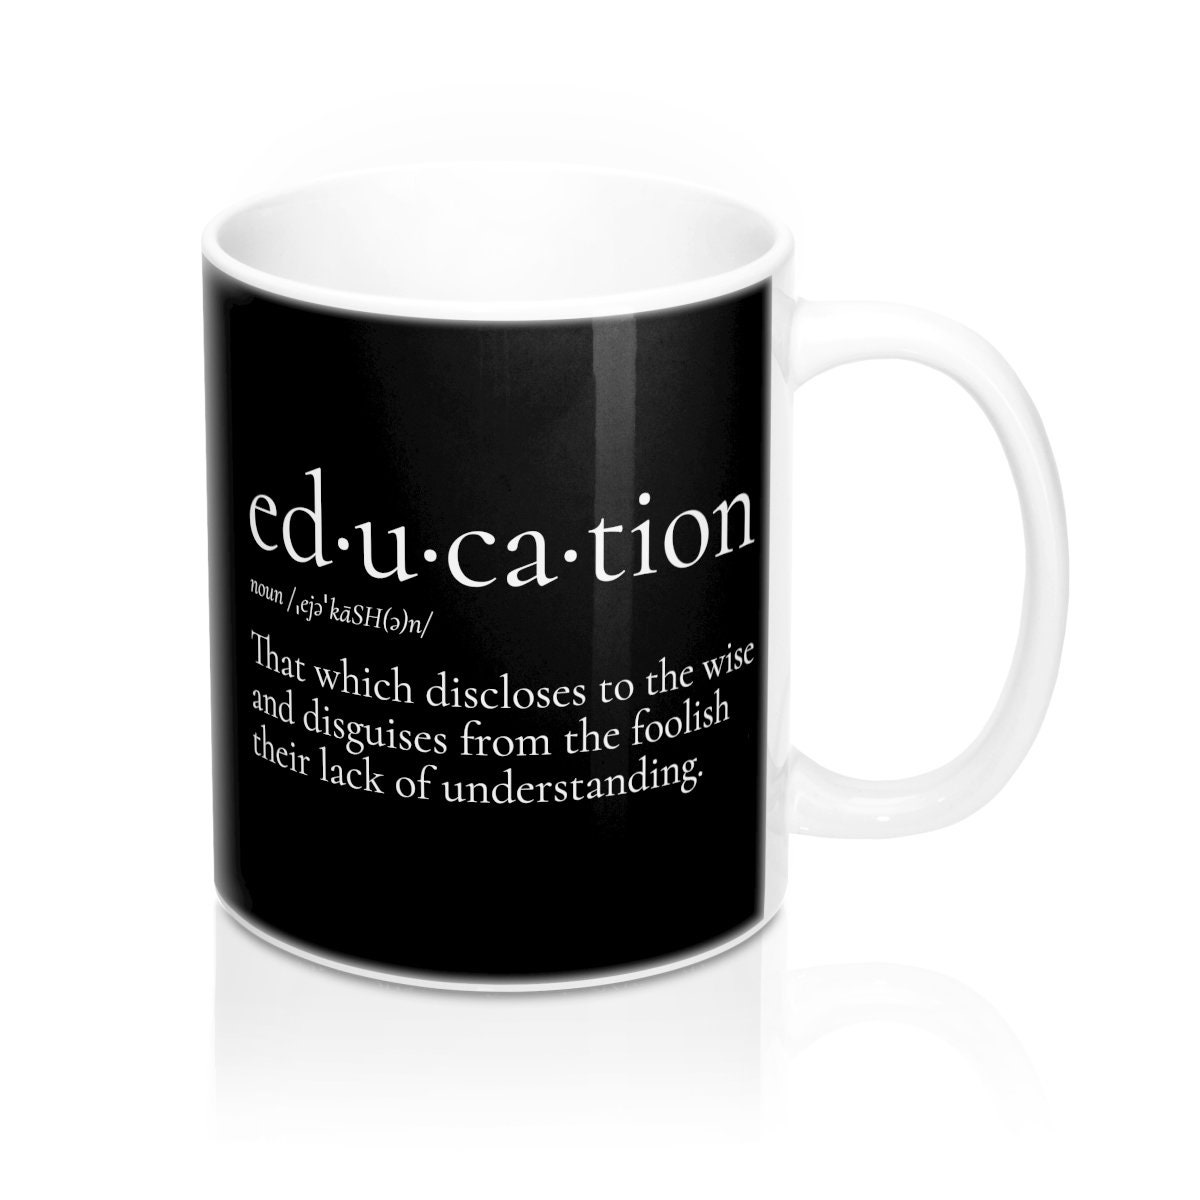 education definition mug 11 oz snarky sarcastic funny | etsy